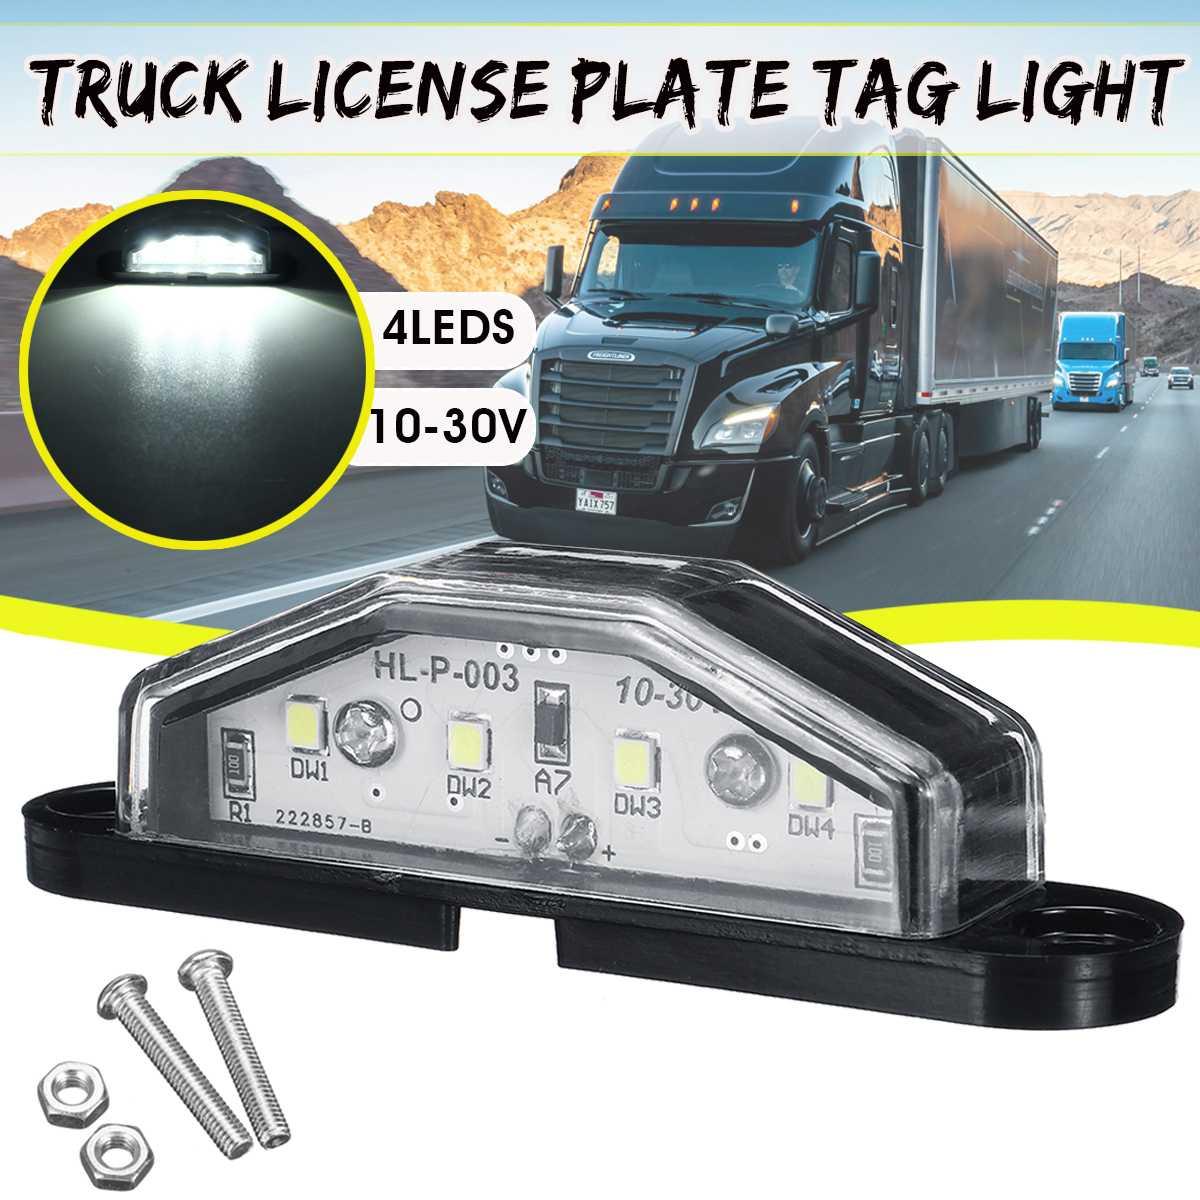 4 LED Car Number License Plate Light Lamp Interior Step Lamp 10-30V Universal for Truck Trailer Caravans(China)